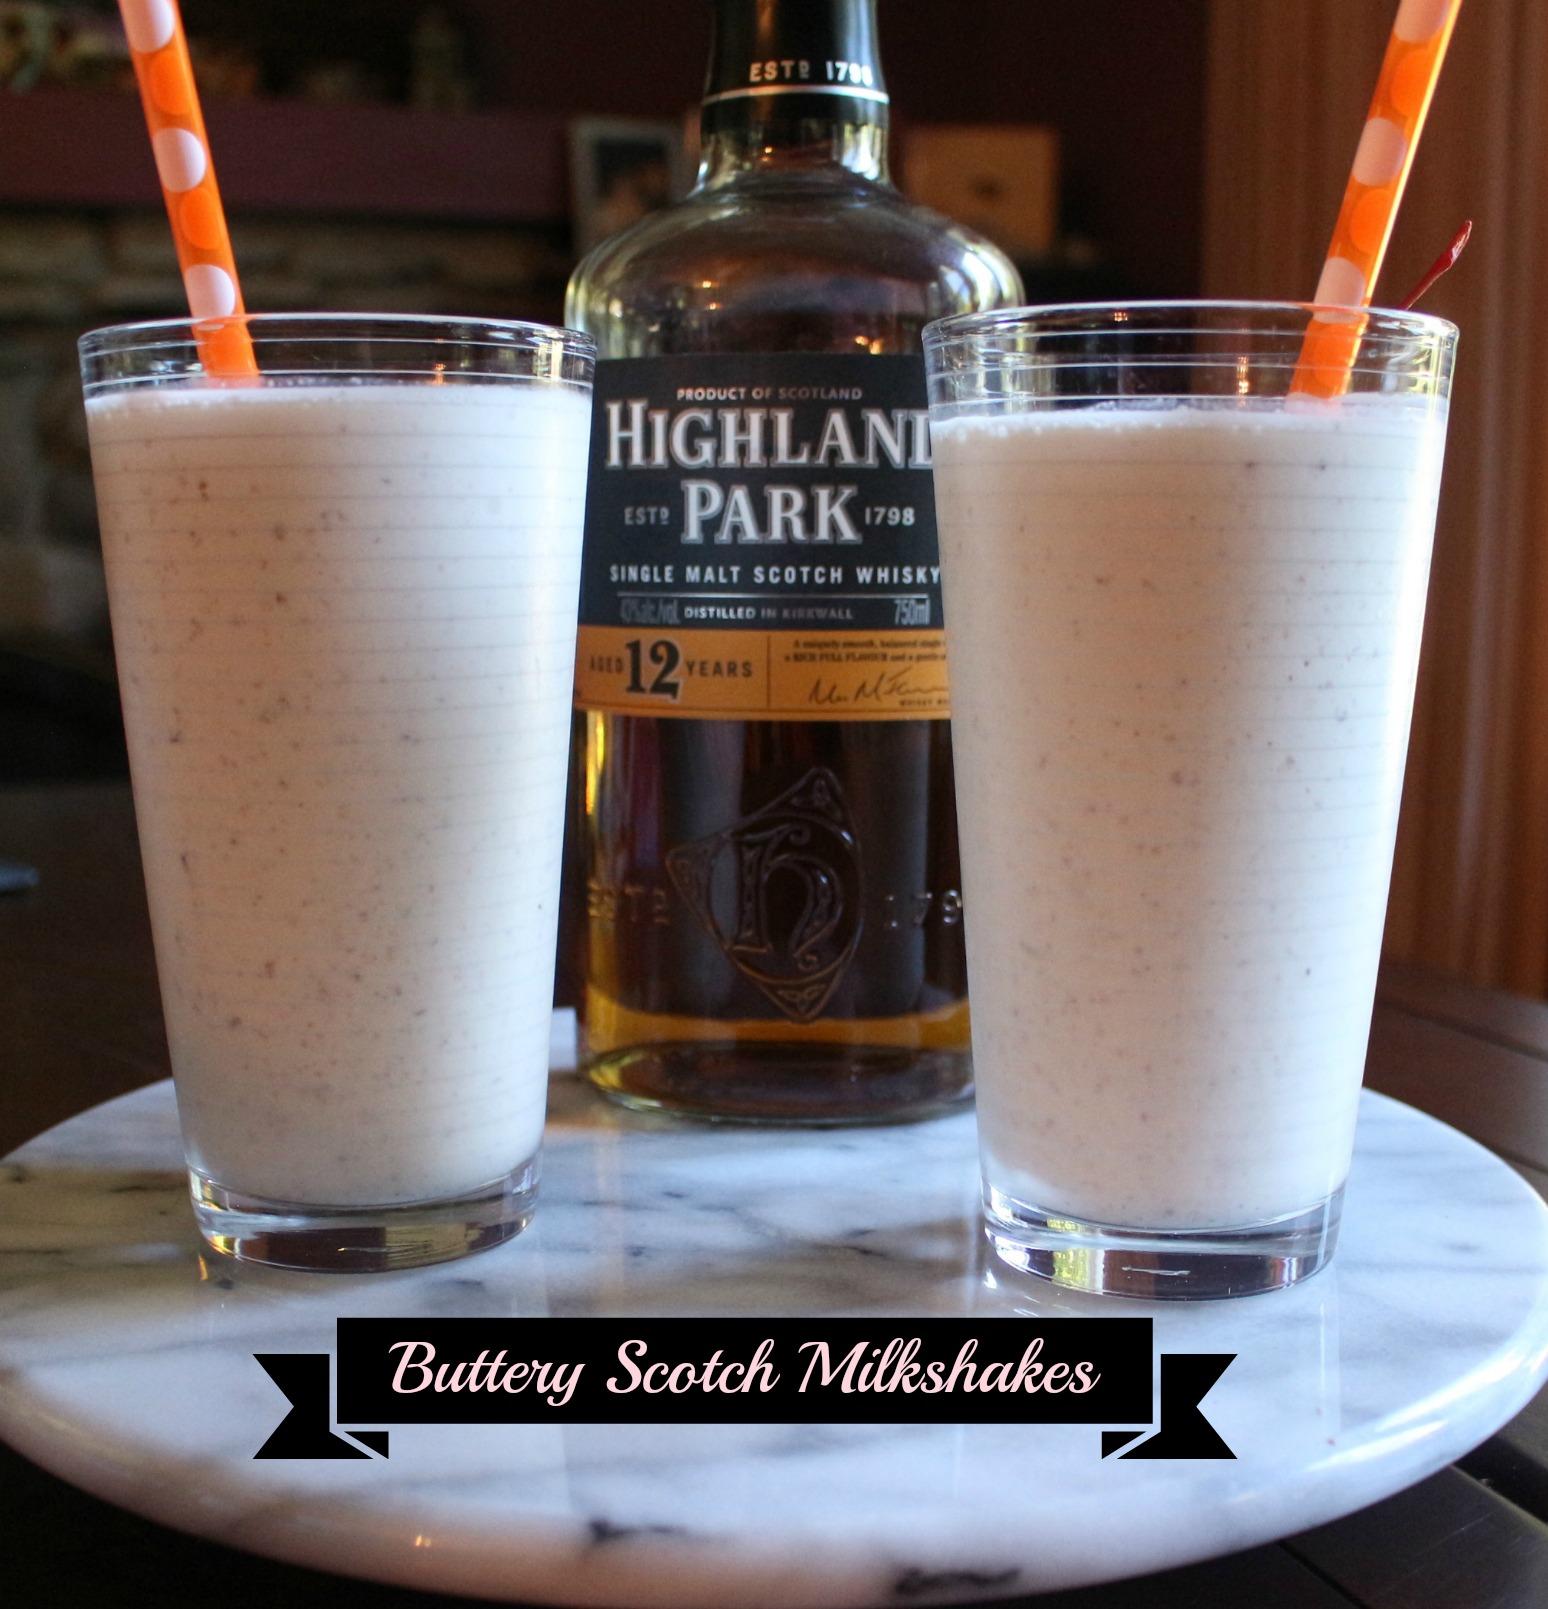 Buttery Scotch Milkshakes